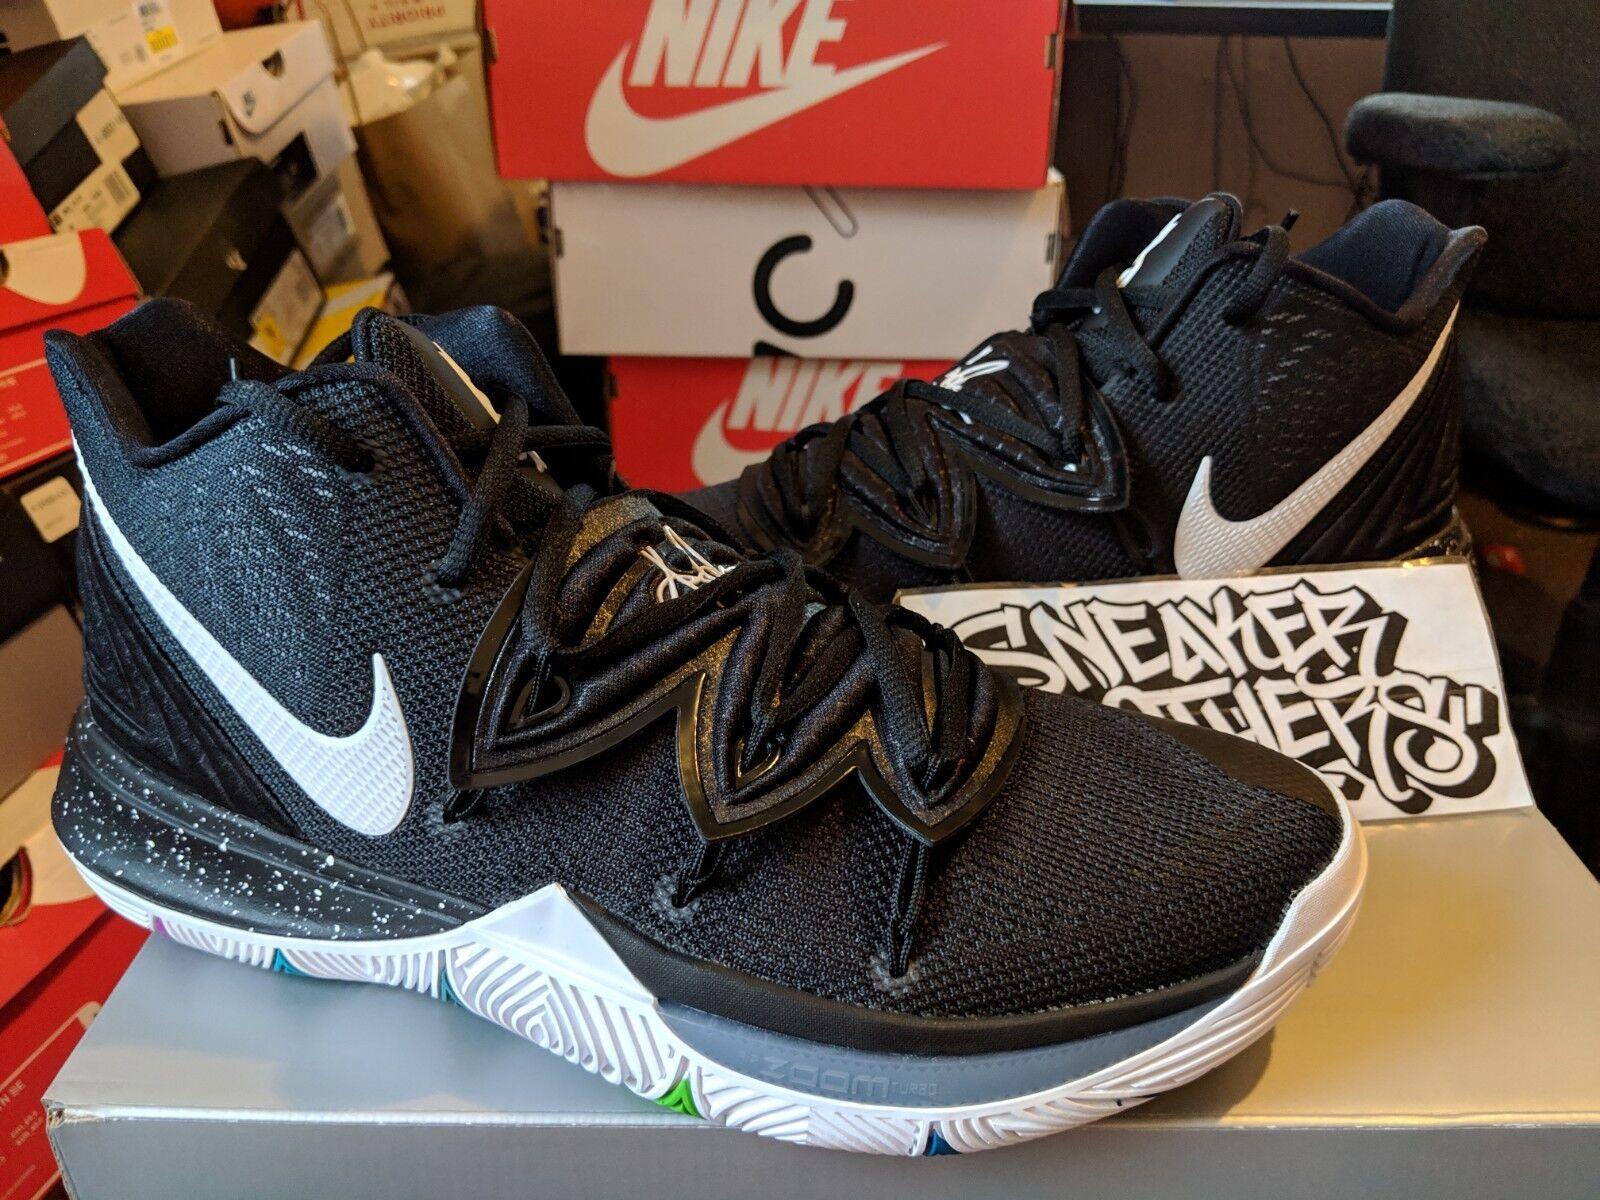 Nike Kyrie 5 Black Magic Multi-color Multi-color Multi-color White Basketball Men's AO2918-901 Irving 786395